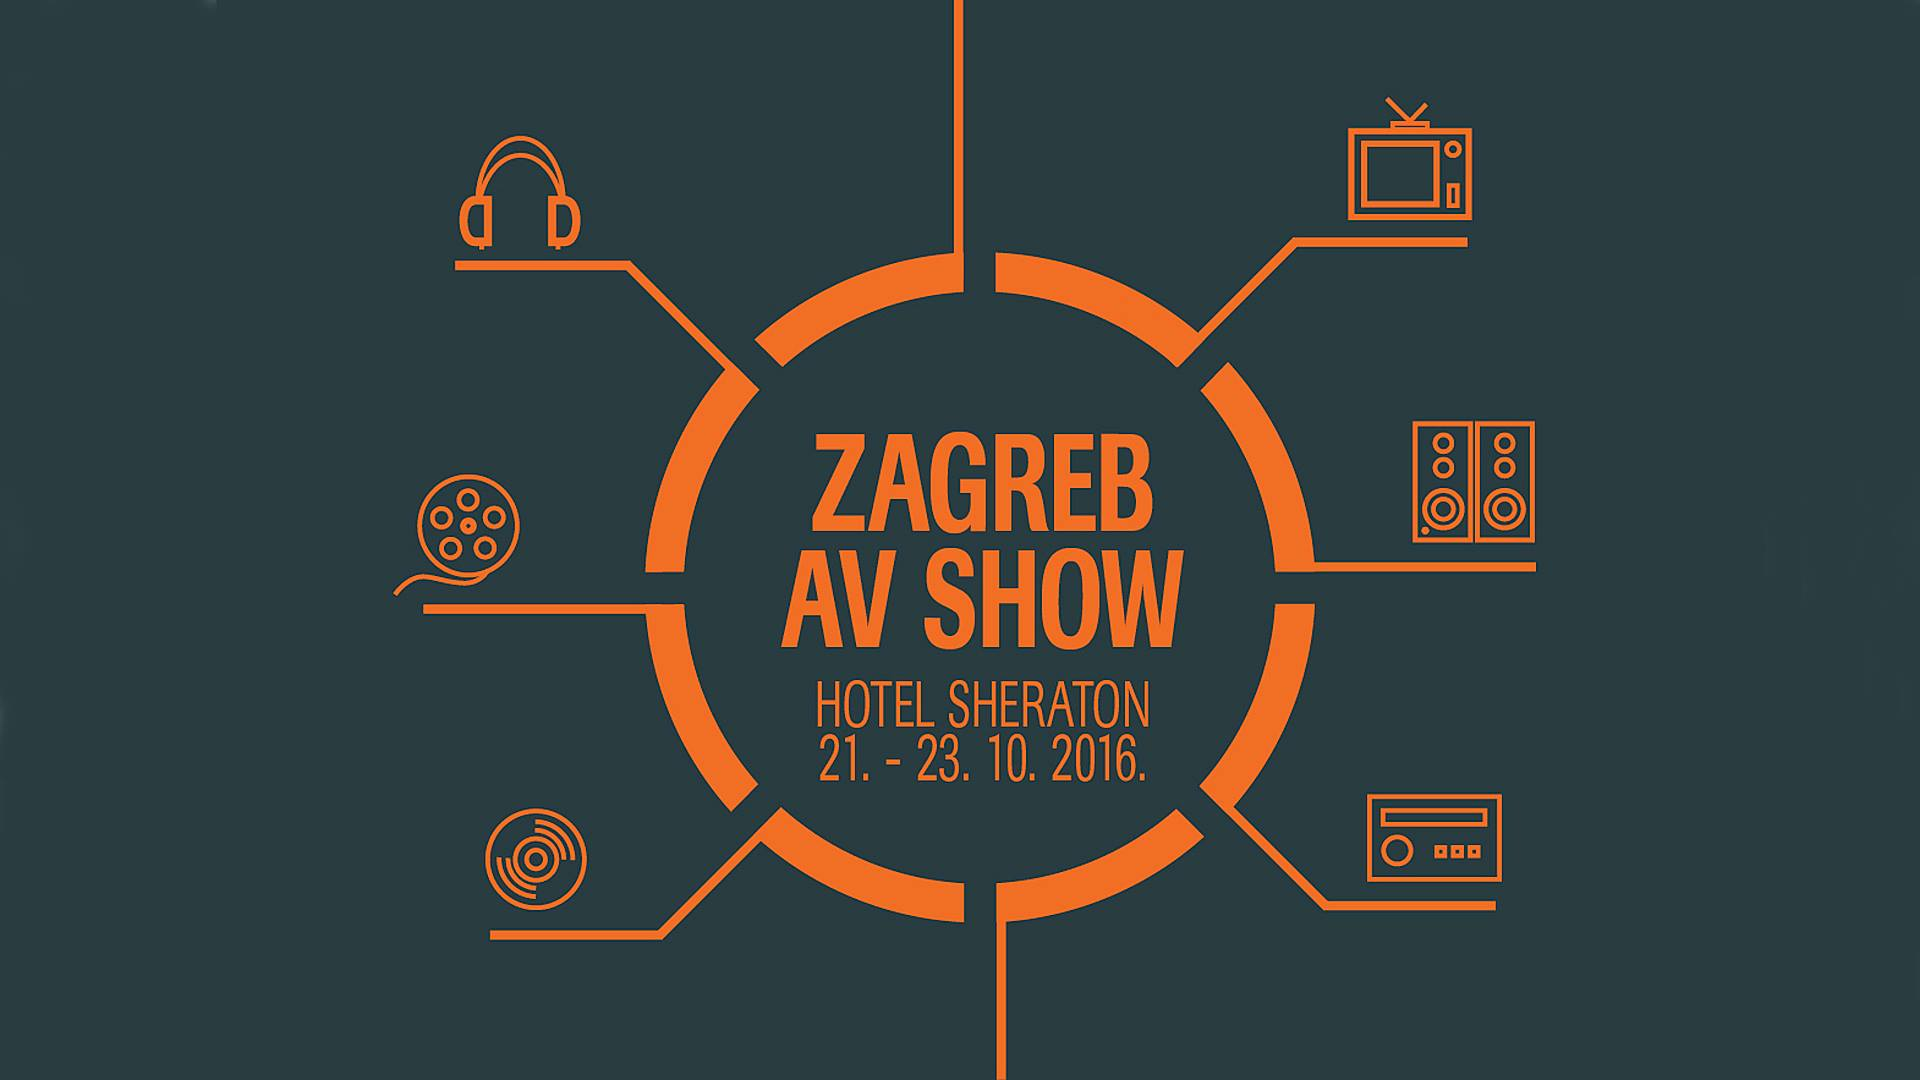 zagreb-av-show